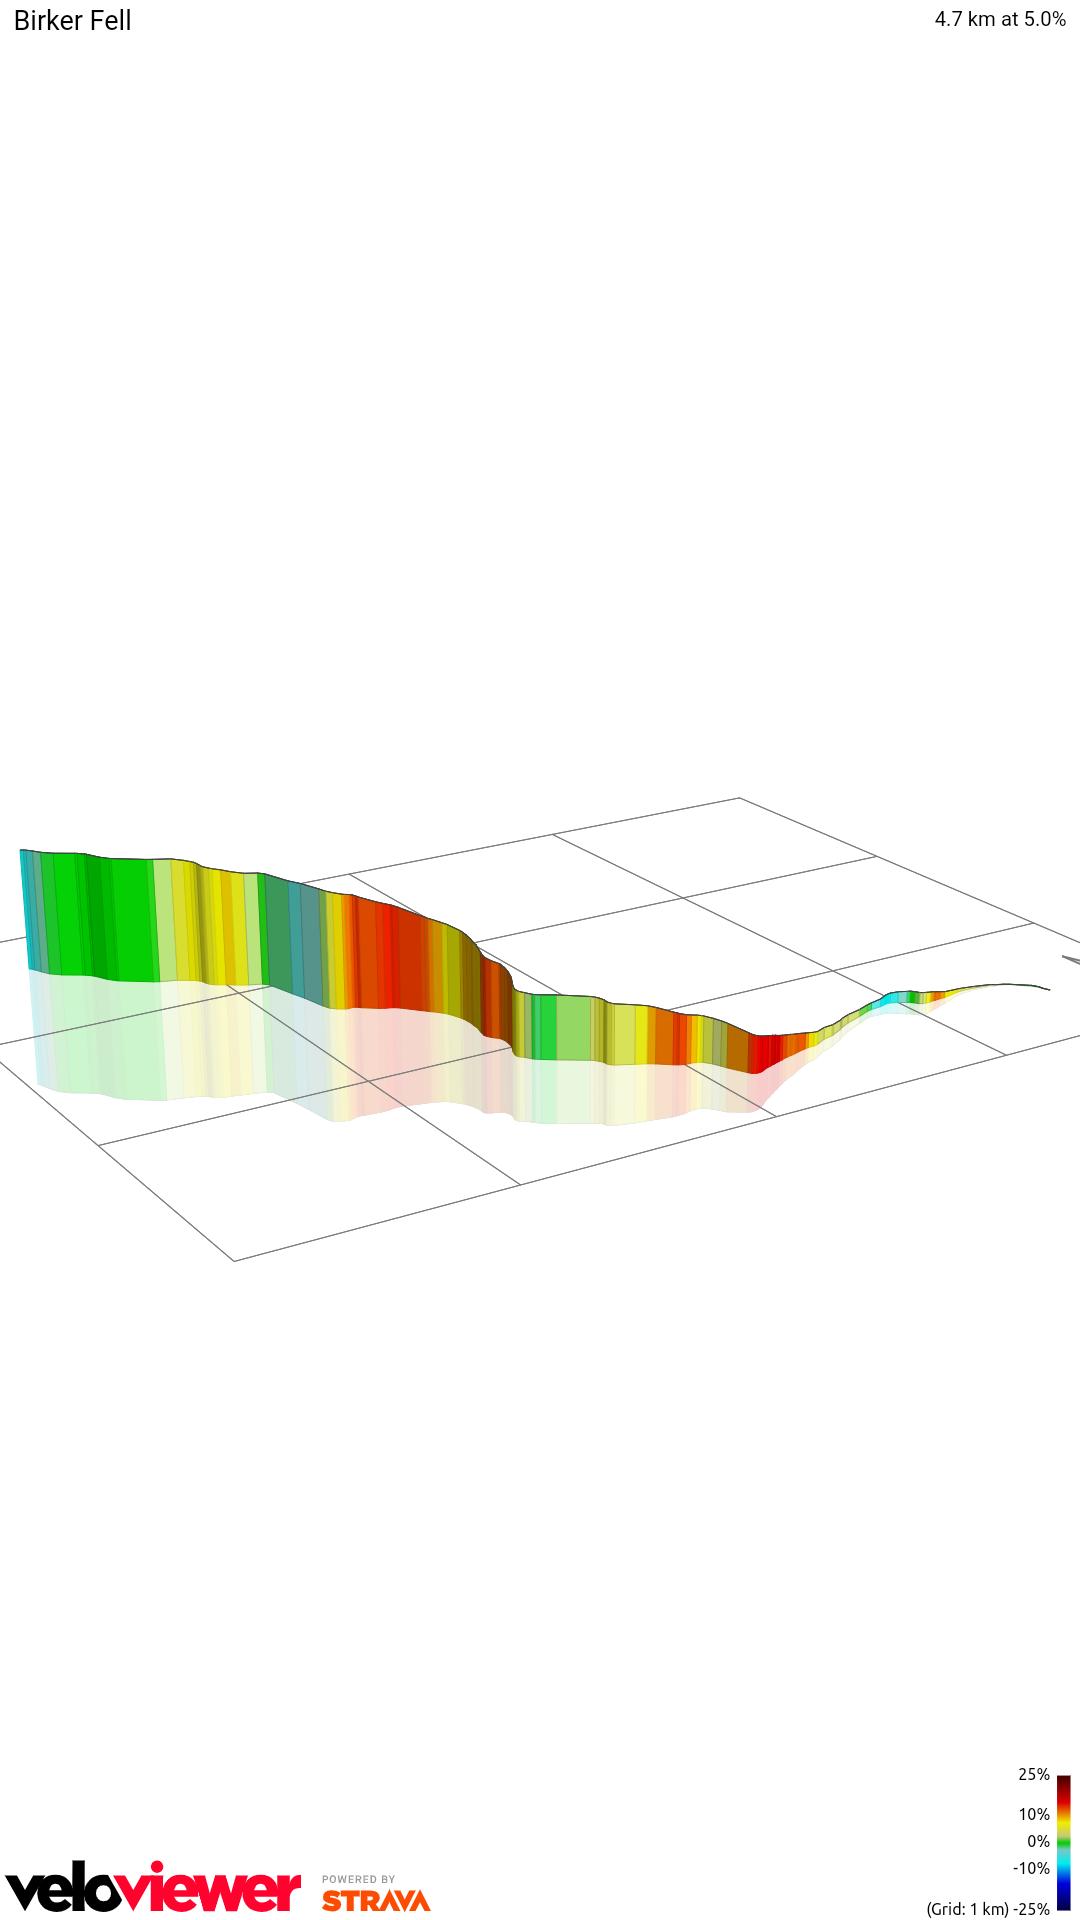 3D Elevation profile image for Birker Fell